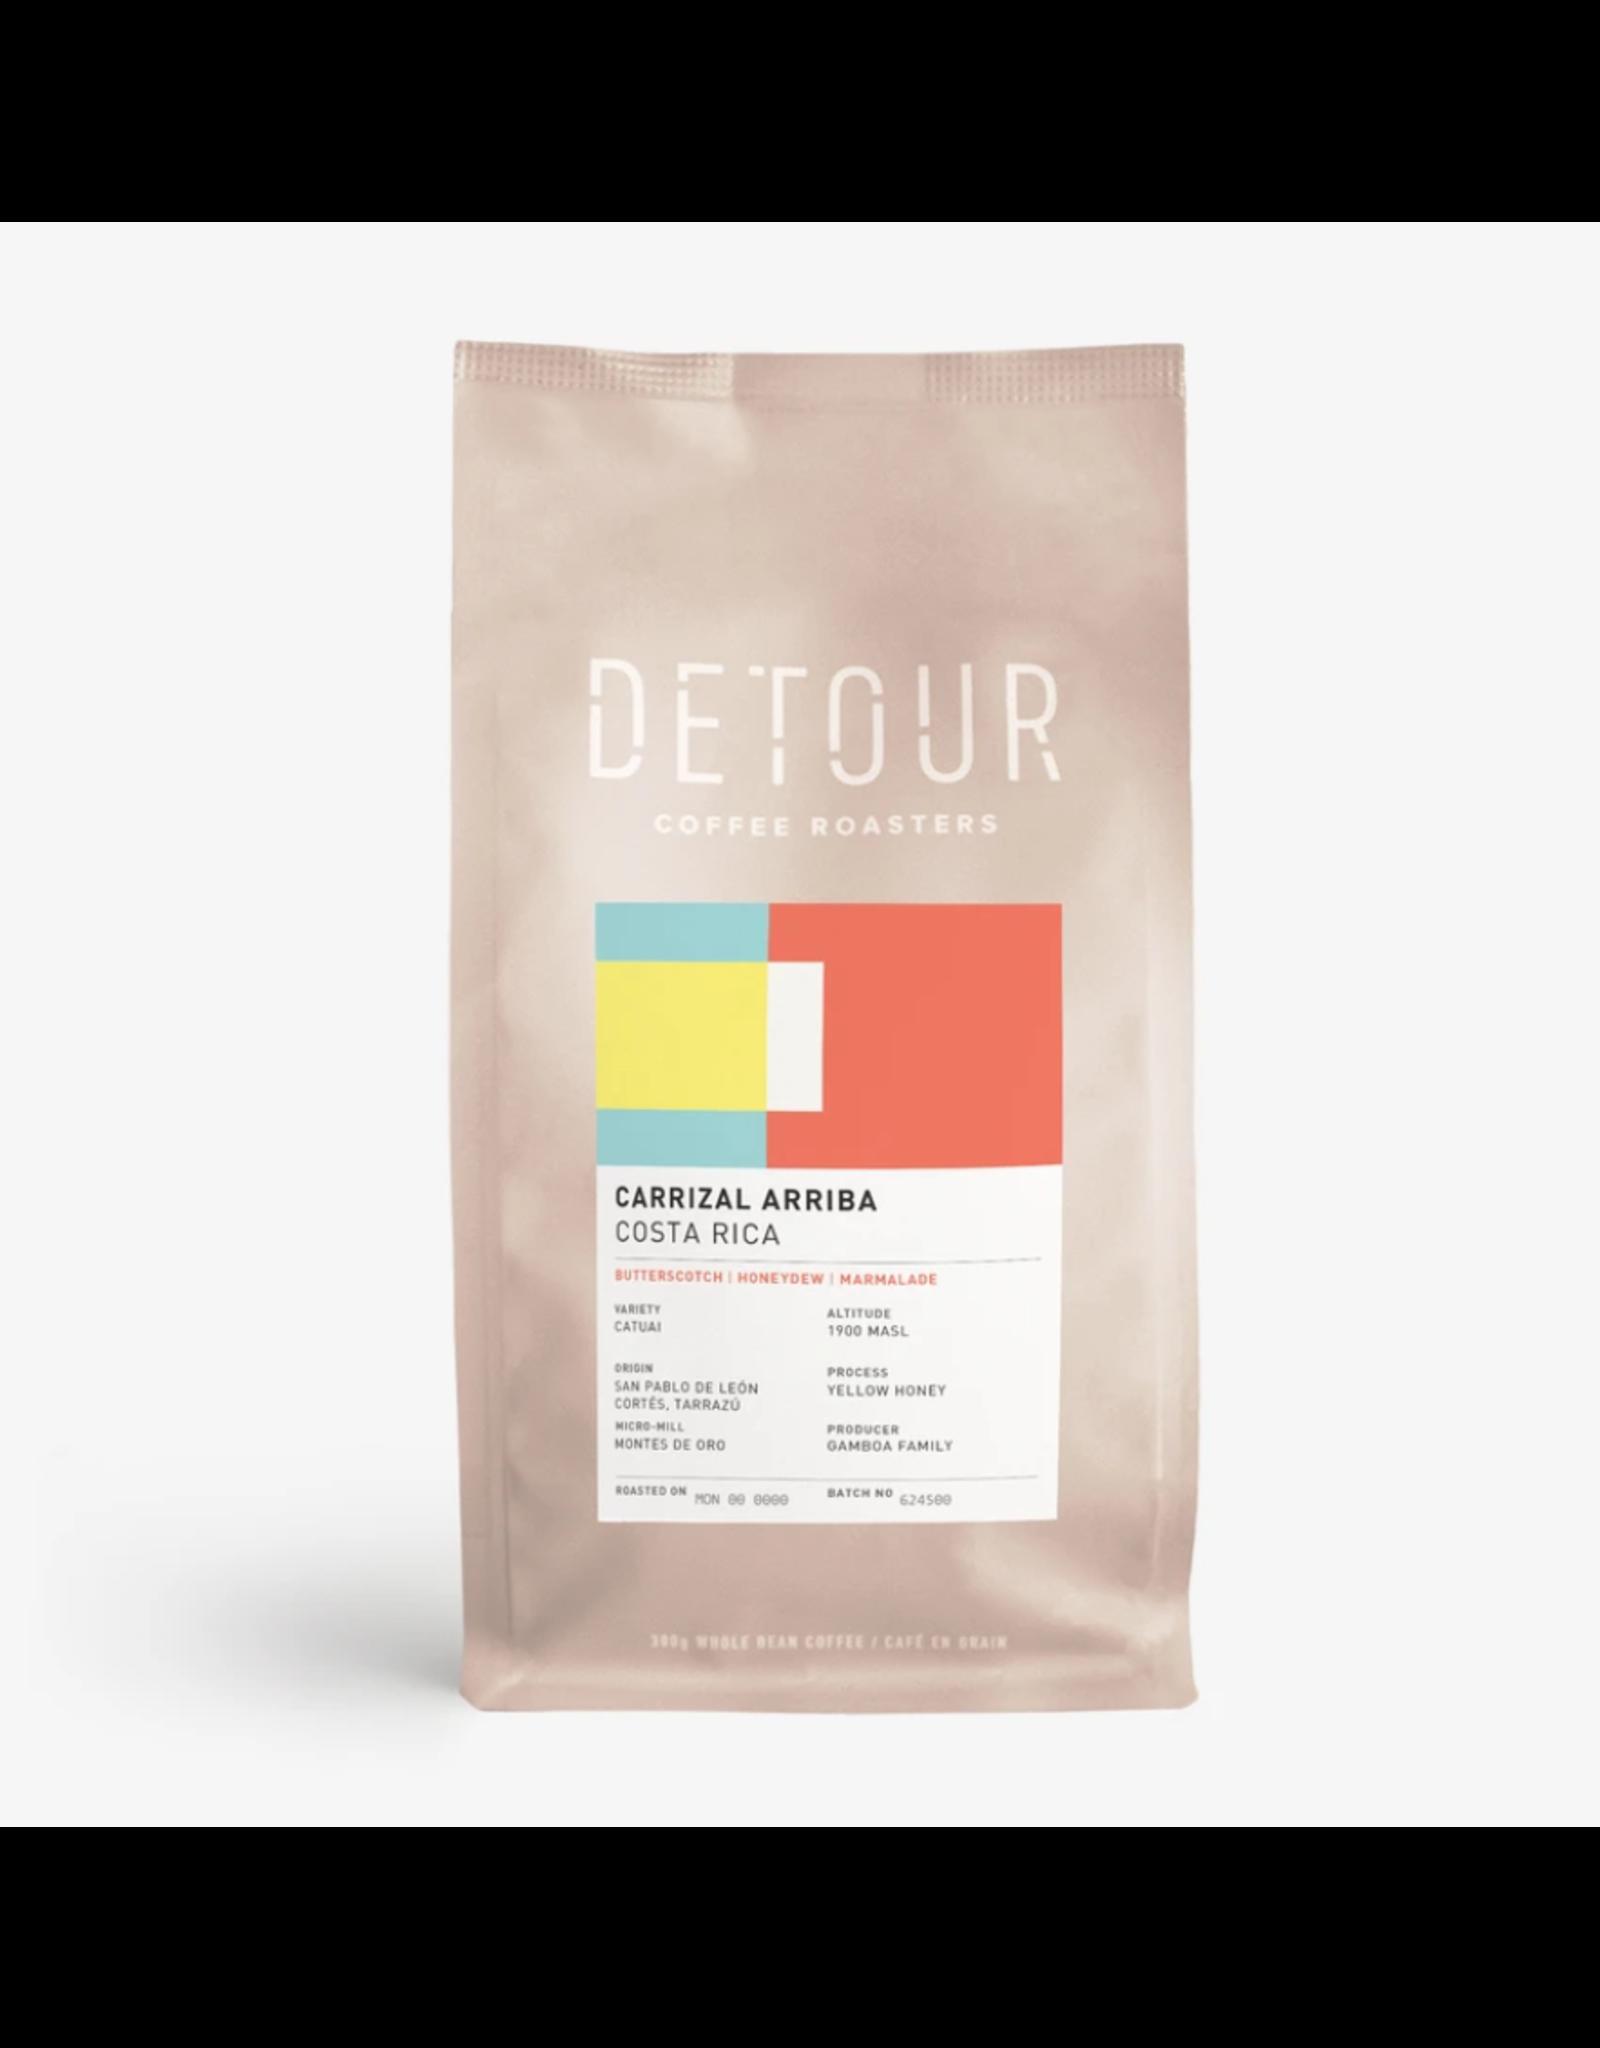 Detour Coffee Detour Coffee, Carrizal Arriba Costa Rica, 300g Beans